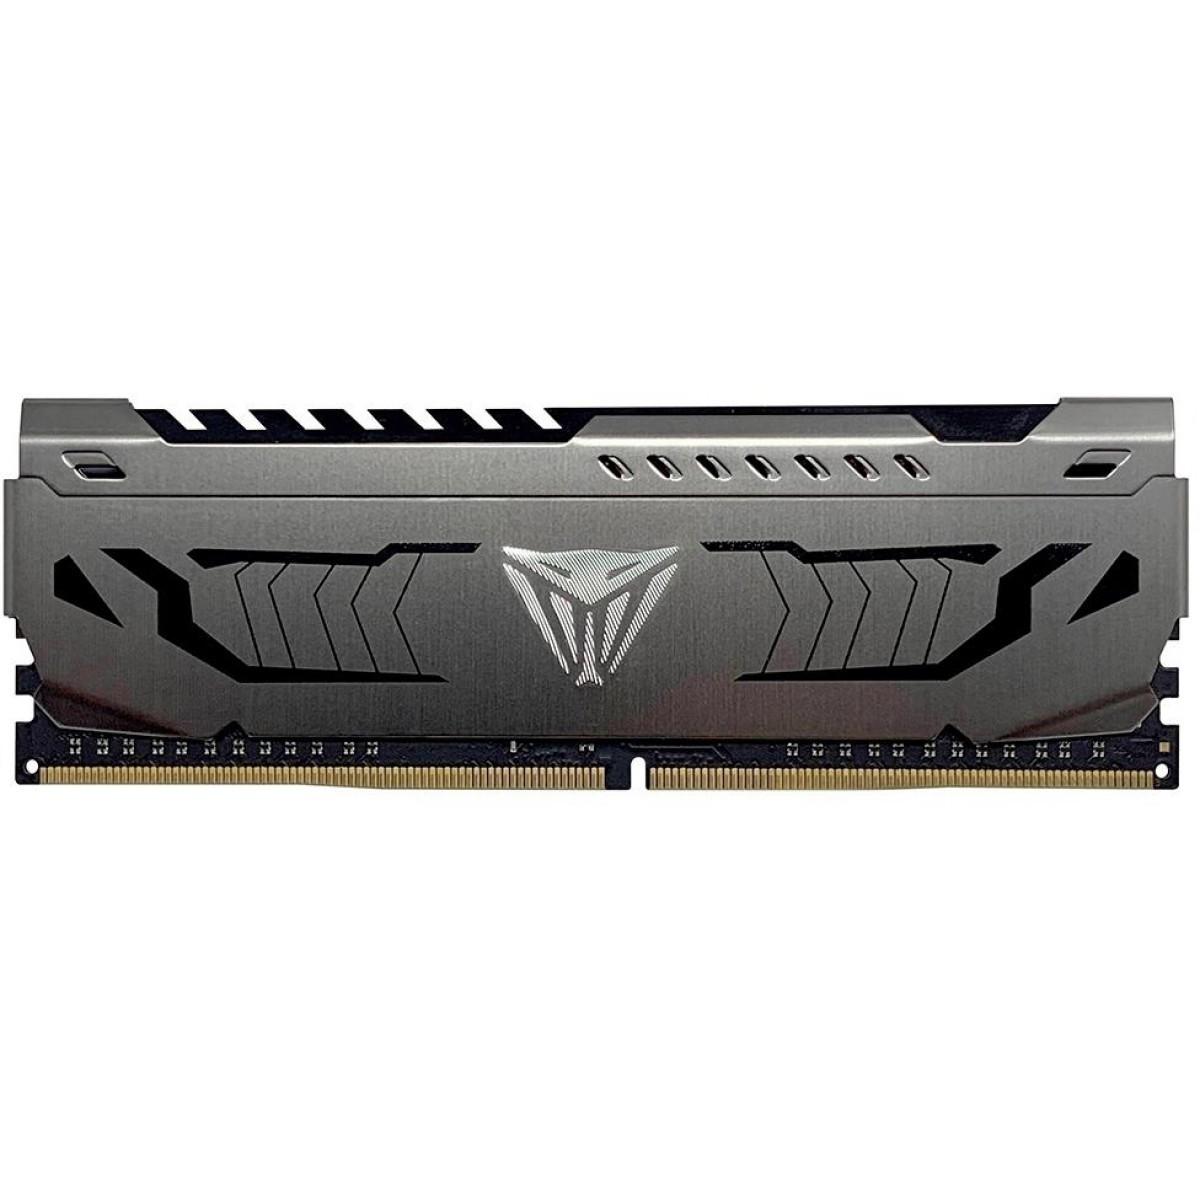 Memória DDR4 Patriot Viper Steel, 16GB 3000MHz, Black, PVS416G300C6